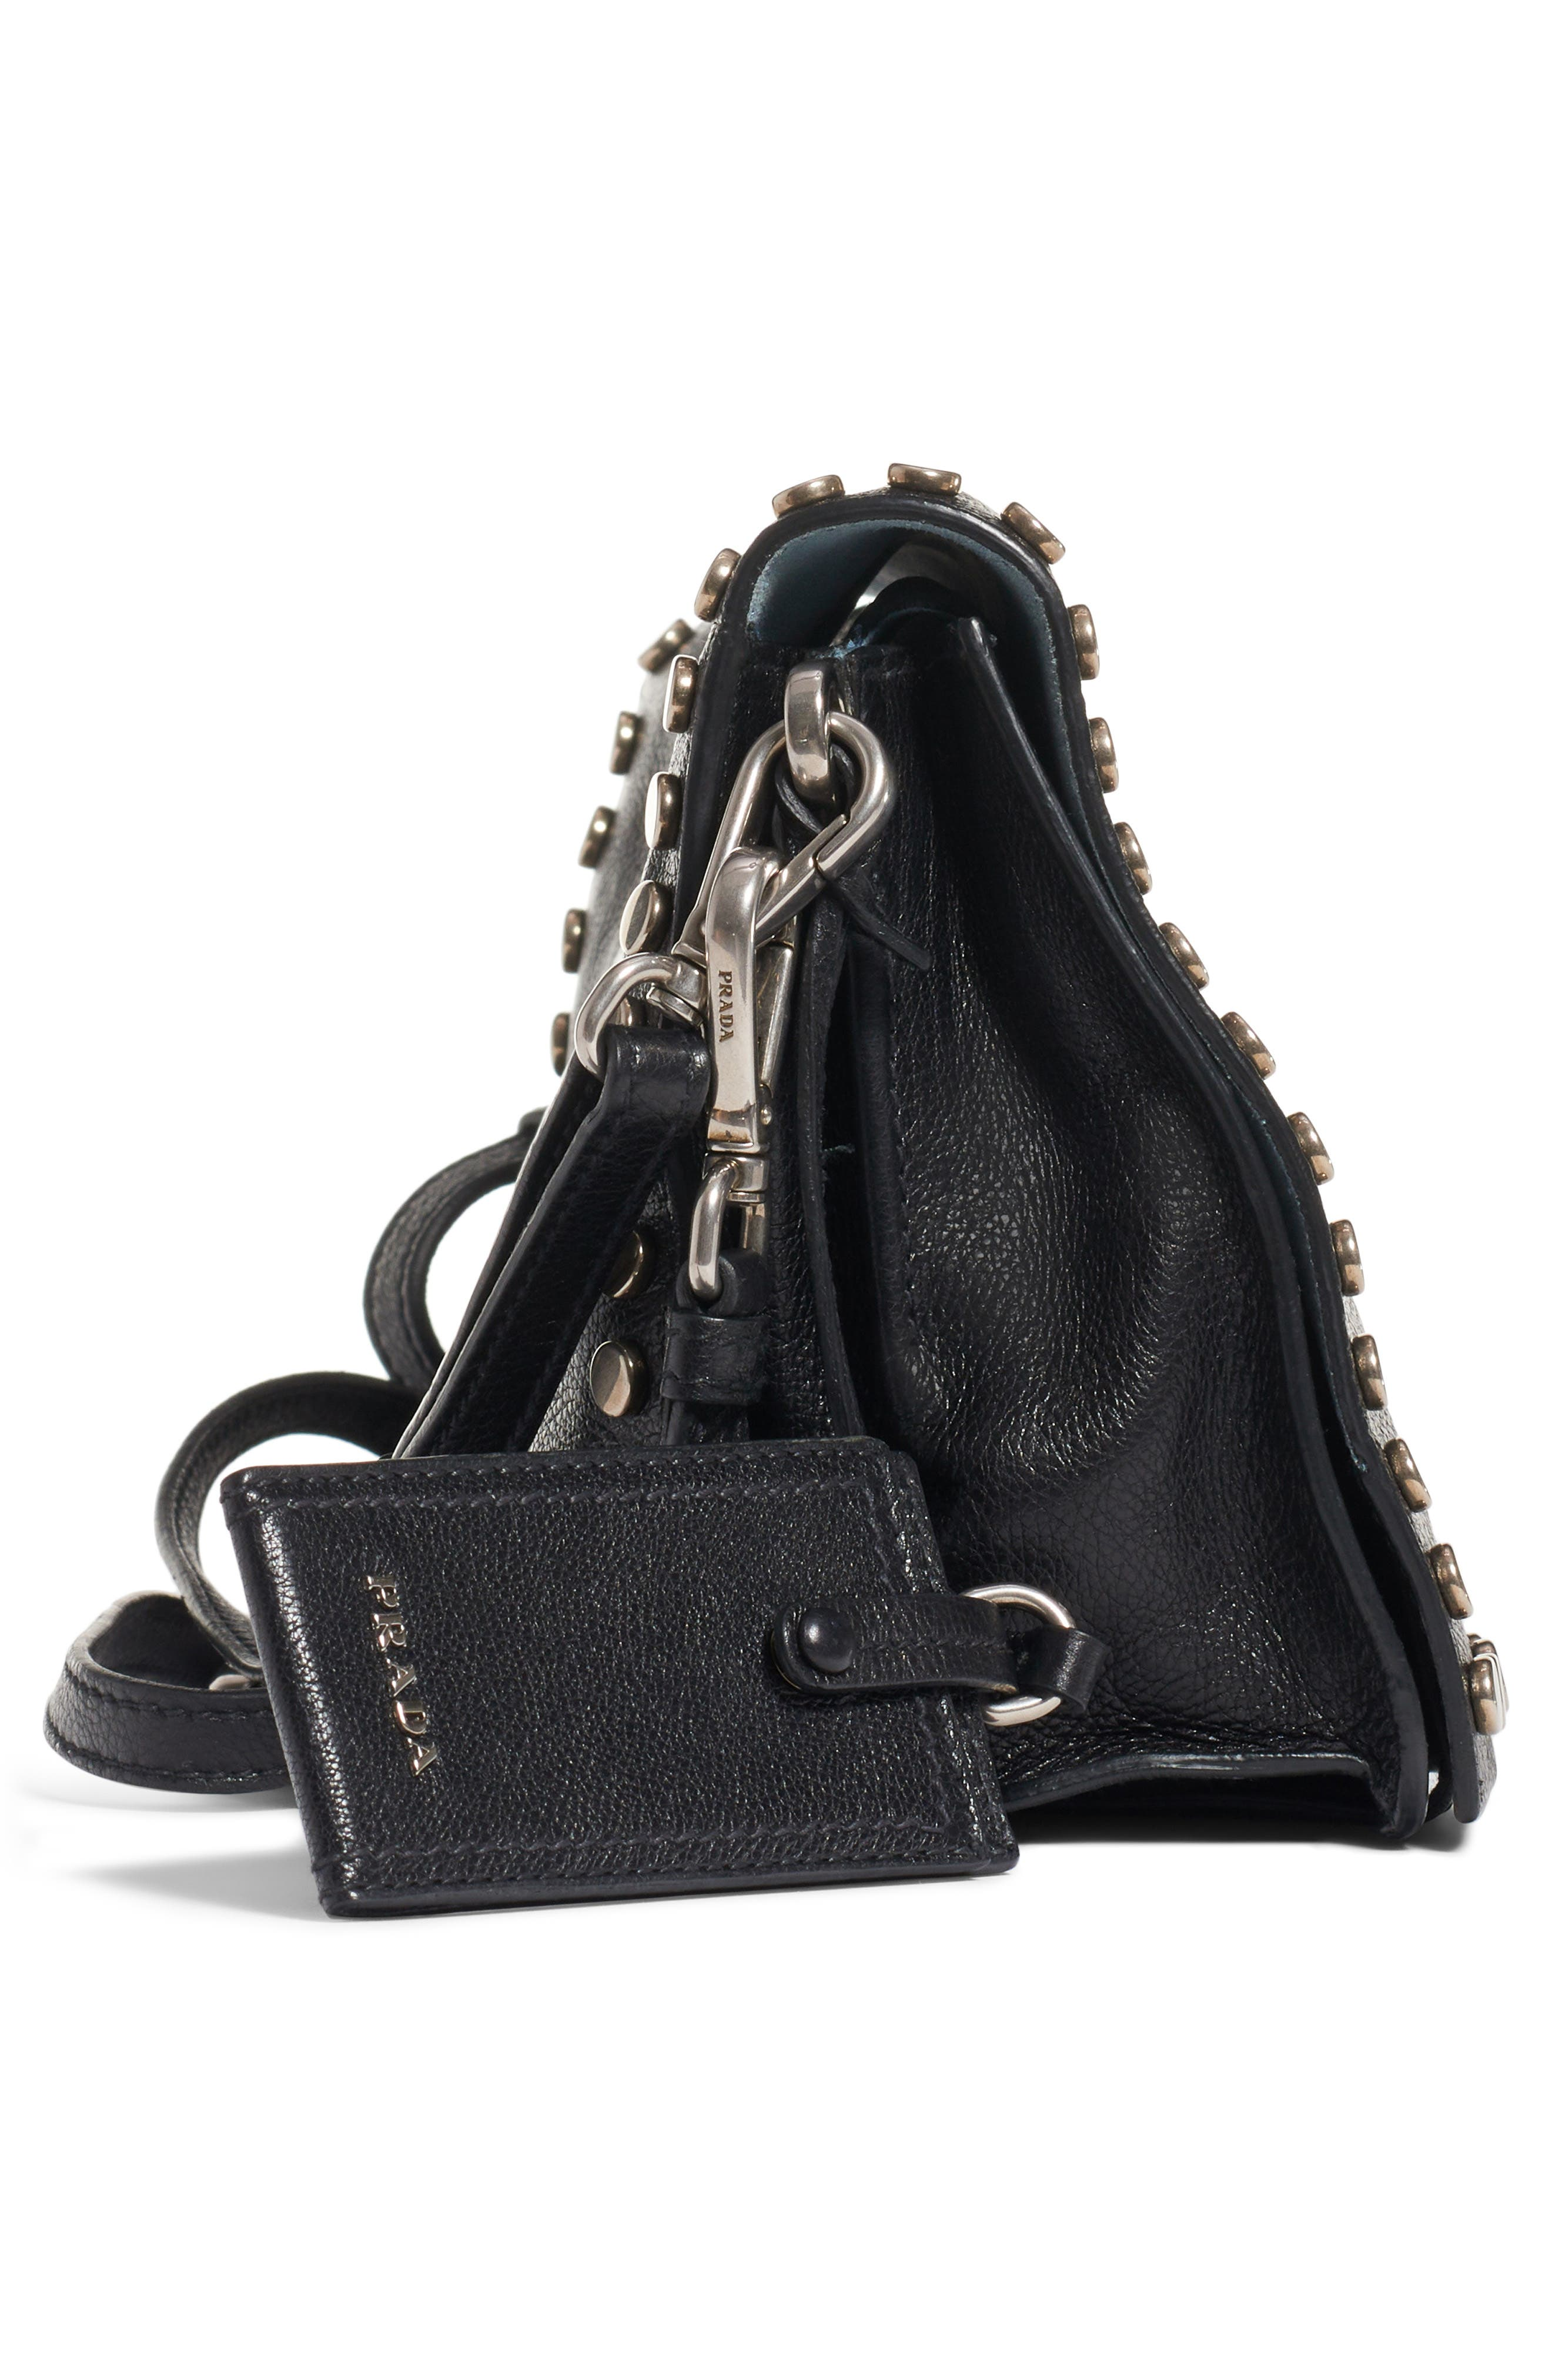 PRADA, Small Stud Etiquette Shoulder Bag, Alternate thumbnail 4, color, NERO/ ASTRALE